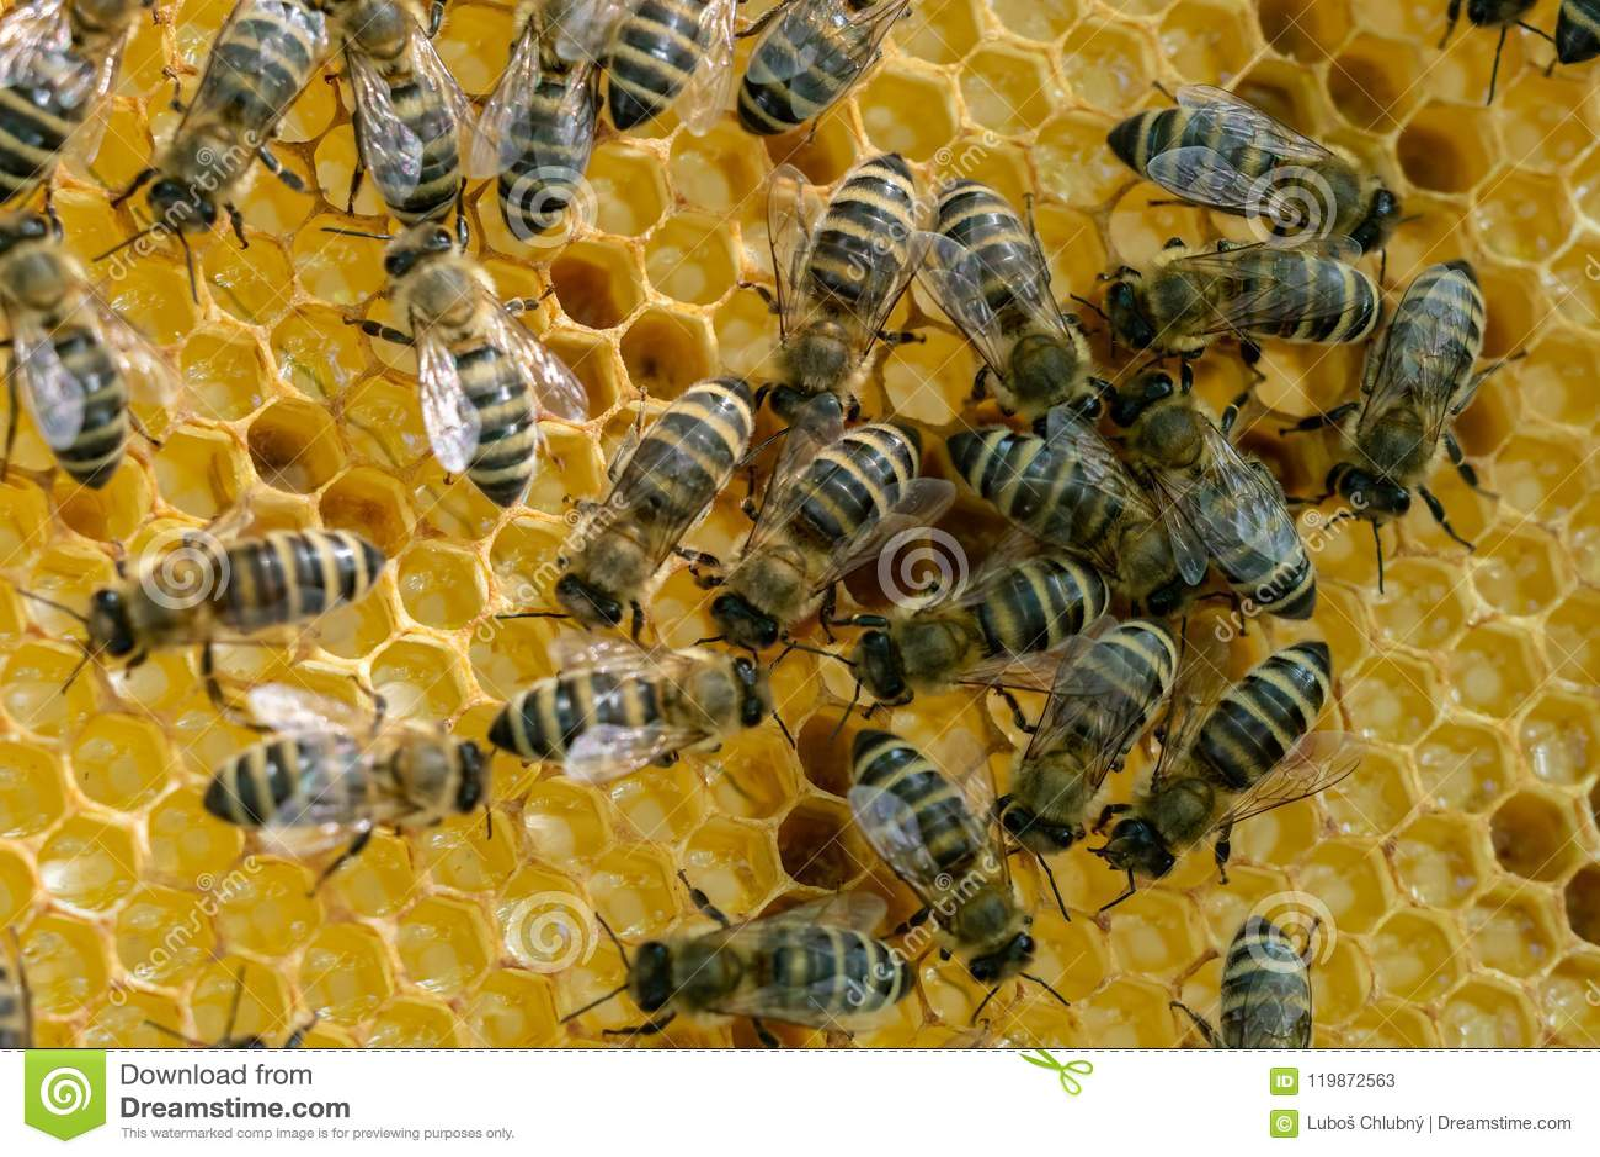 Honeycomb full of bees. Beekeeping concept.